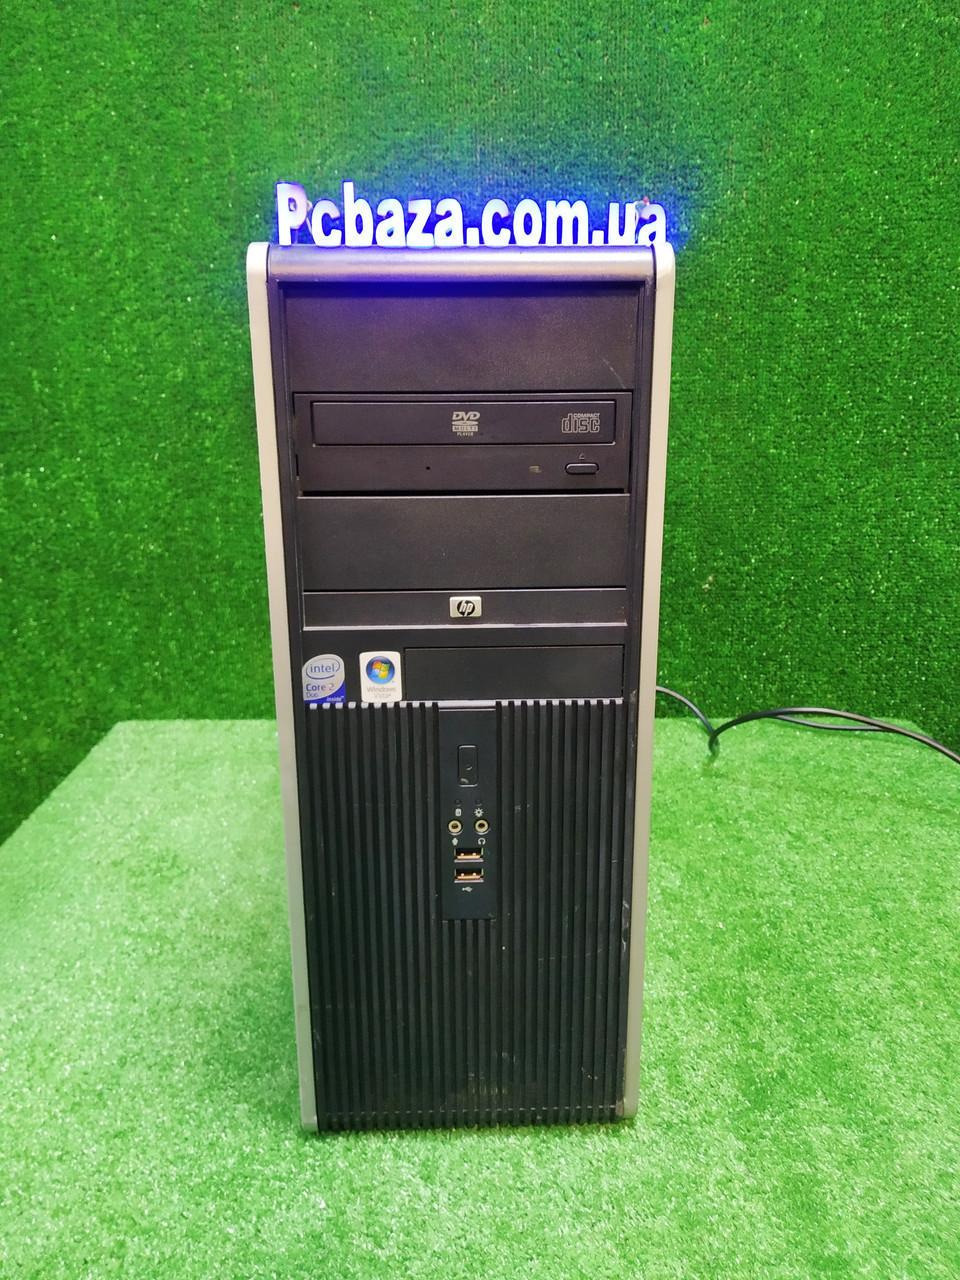 Компьютер HP dc 7800, Intel 2 мощных ядра E7500 2.93Ггц, 4 ГБ, 500 ГБ Настроен! Есть Опт! Гарантия!